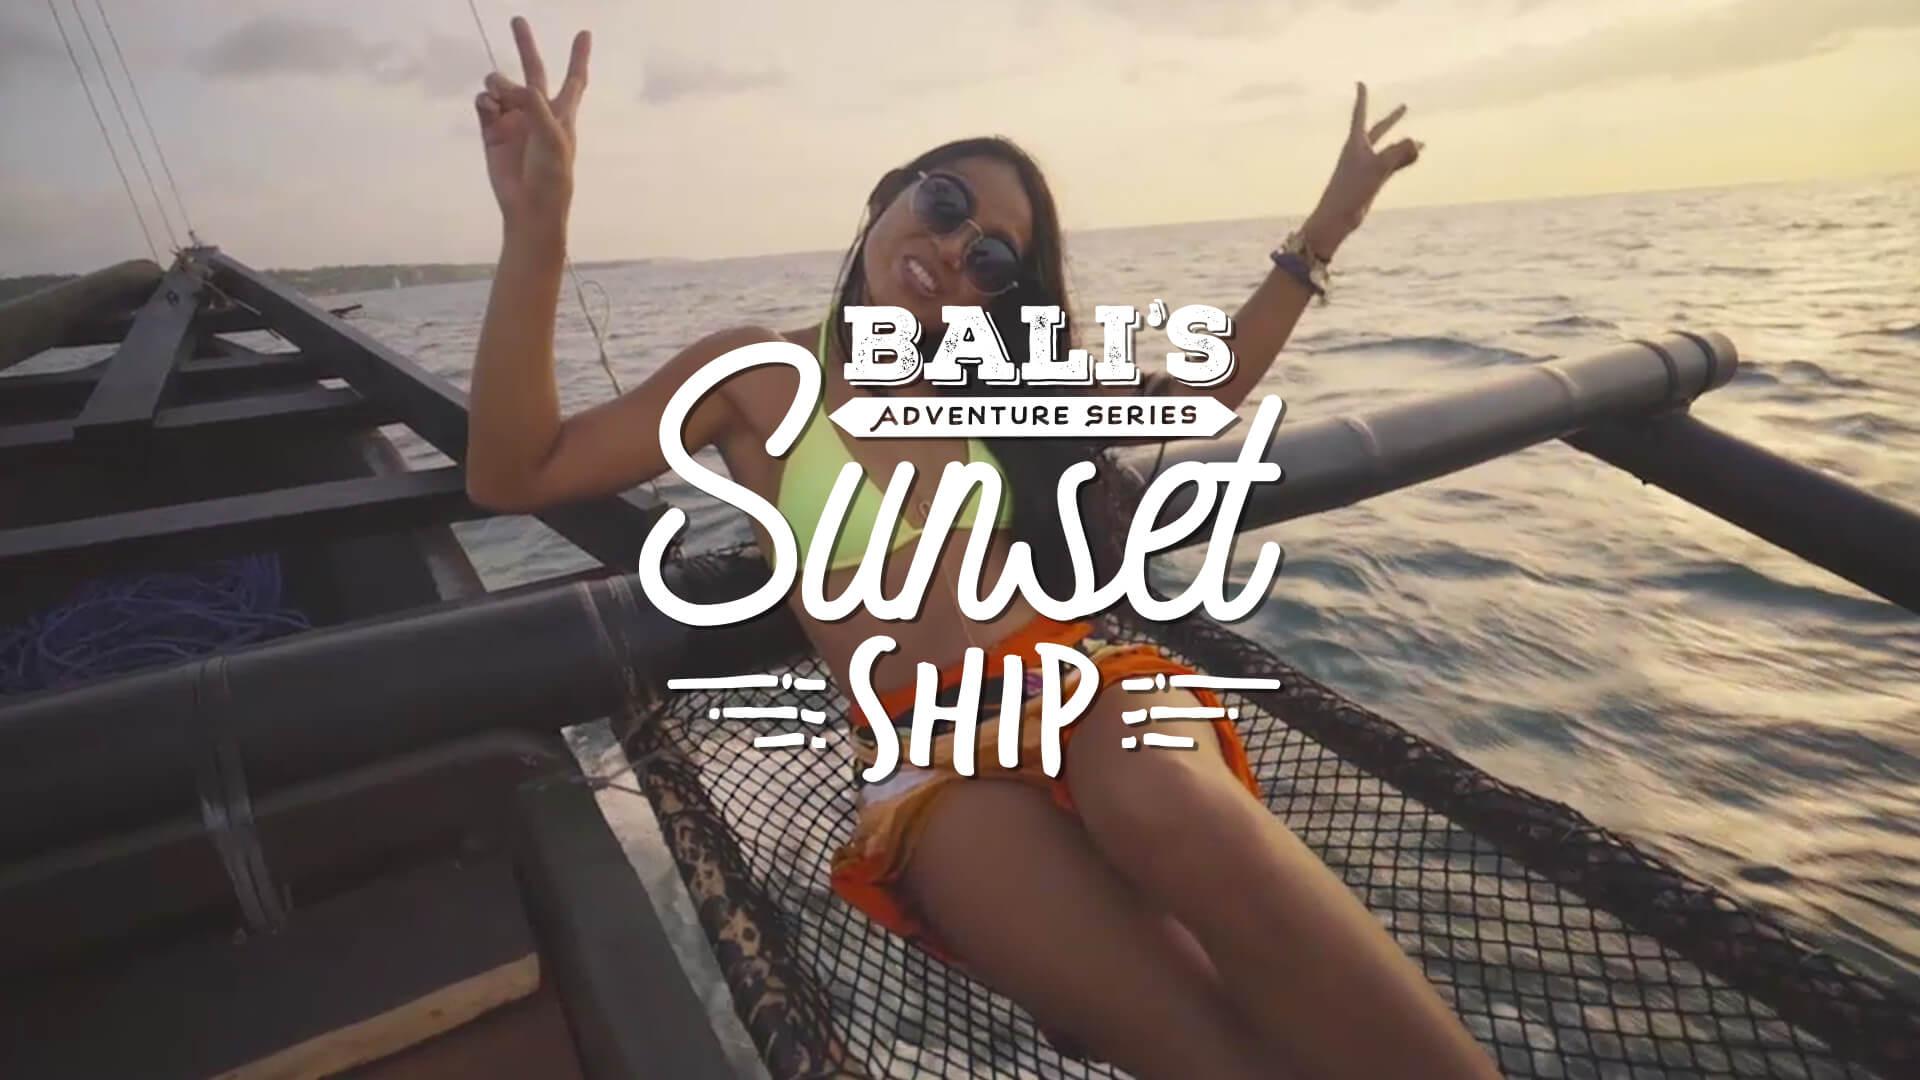 Bali's Adventure Series: The Sunset Ship